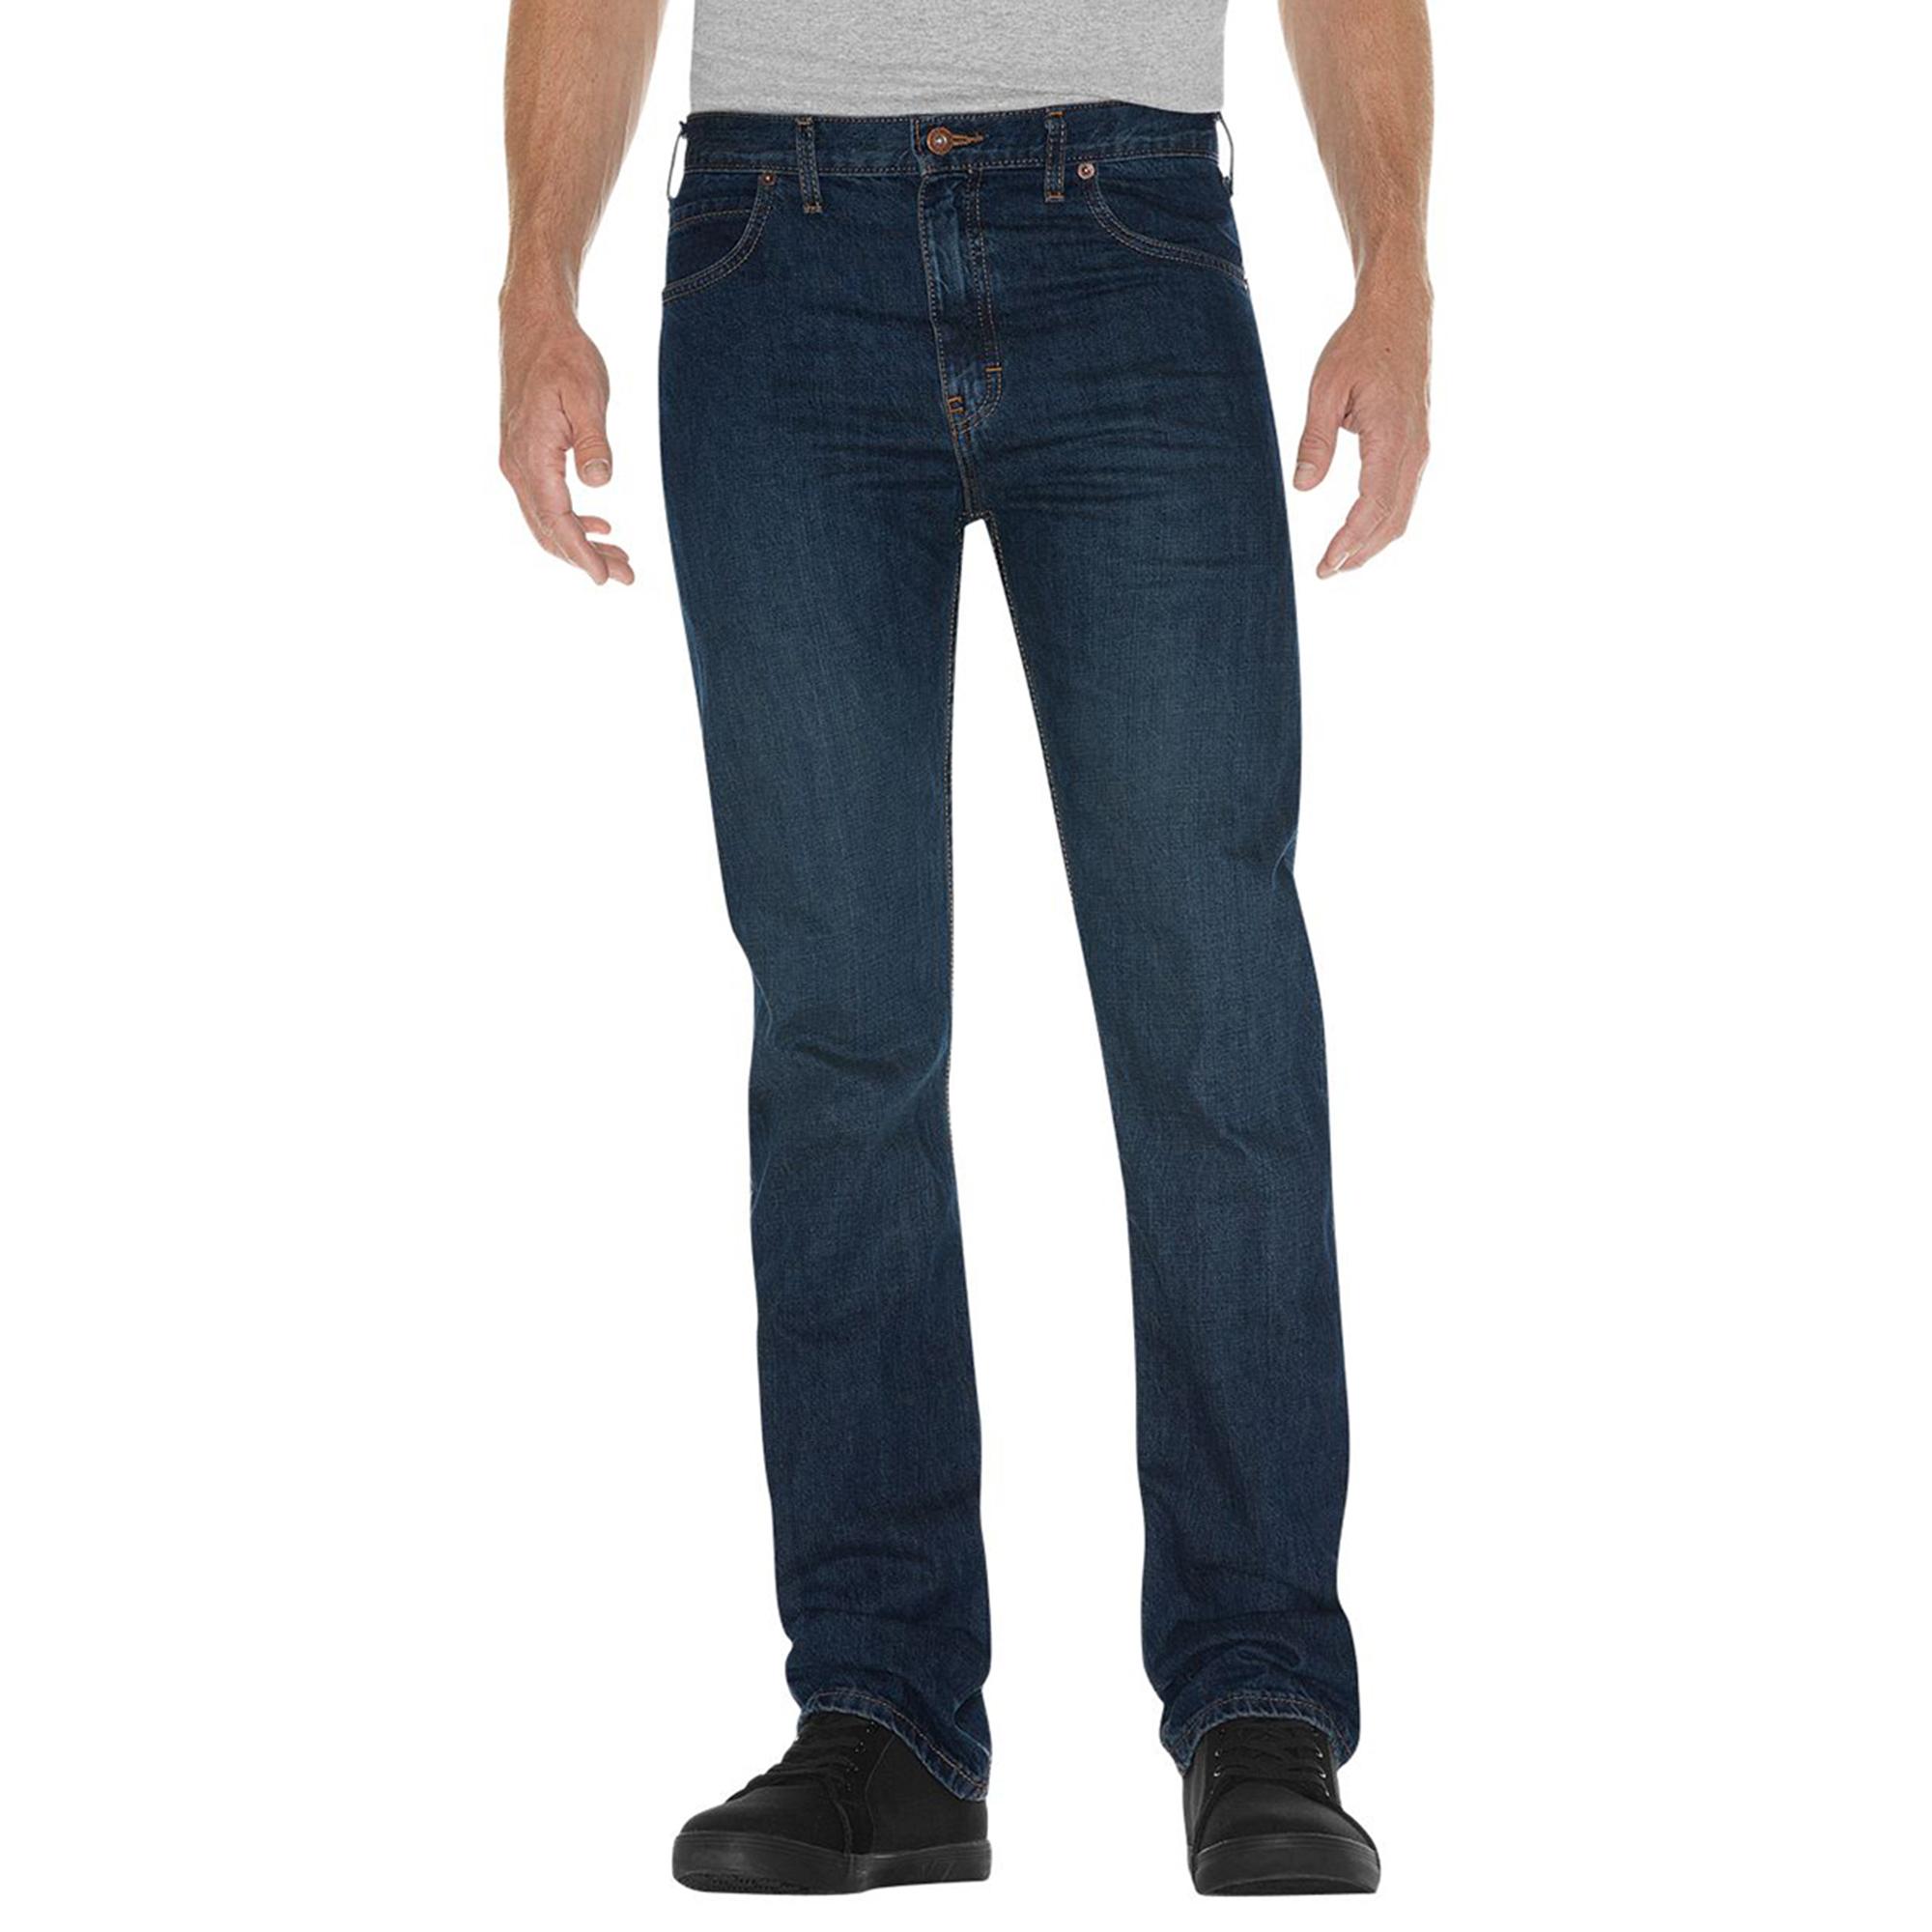 Dickies DD010 Men's Slim Straight Fit 5-Pocket Jean at Sears.com